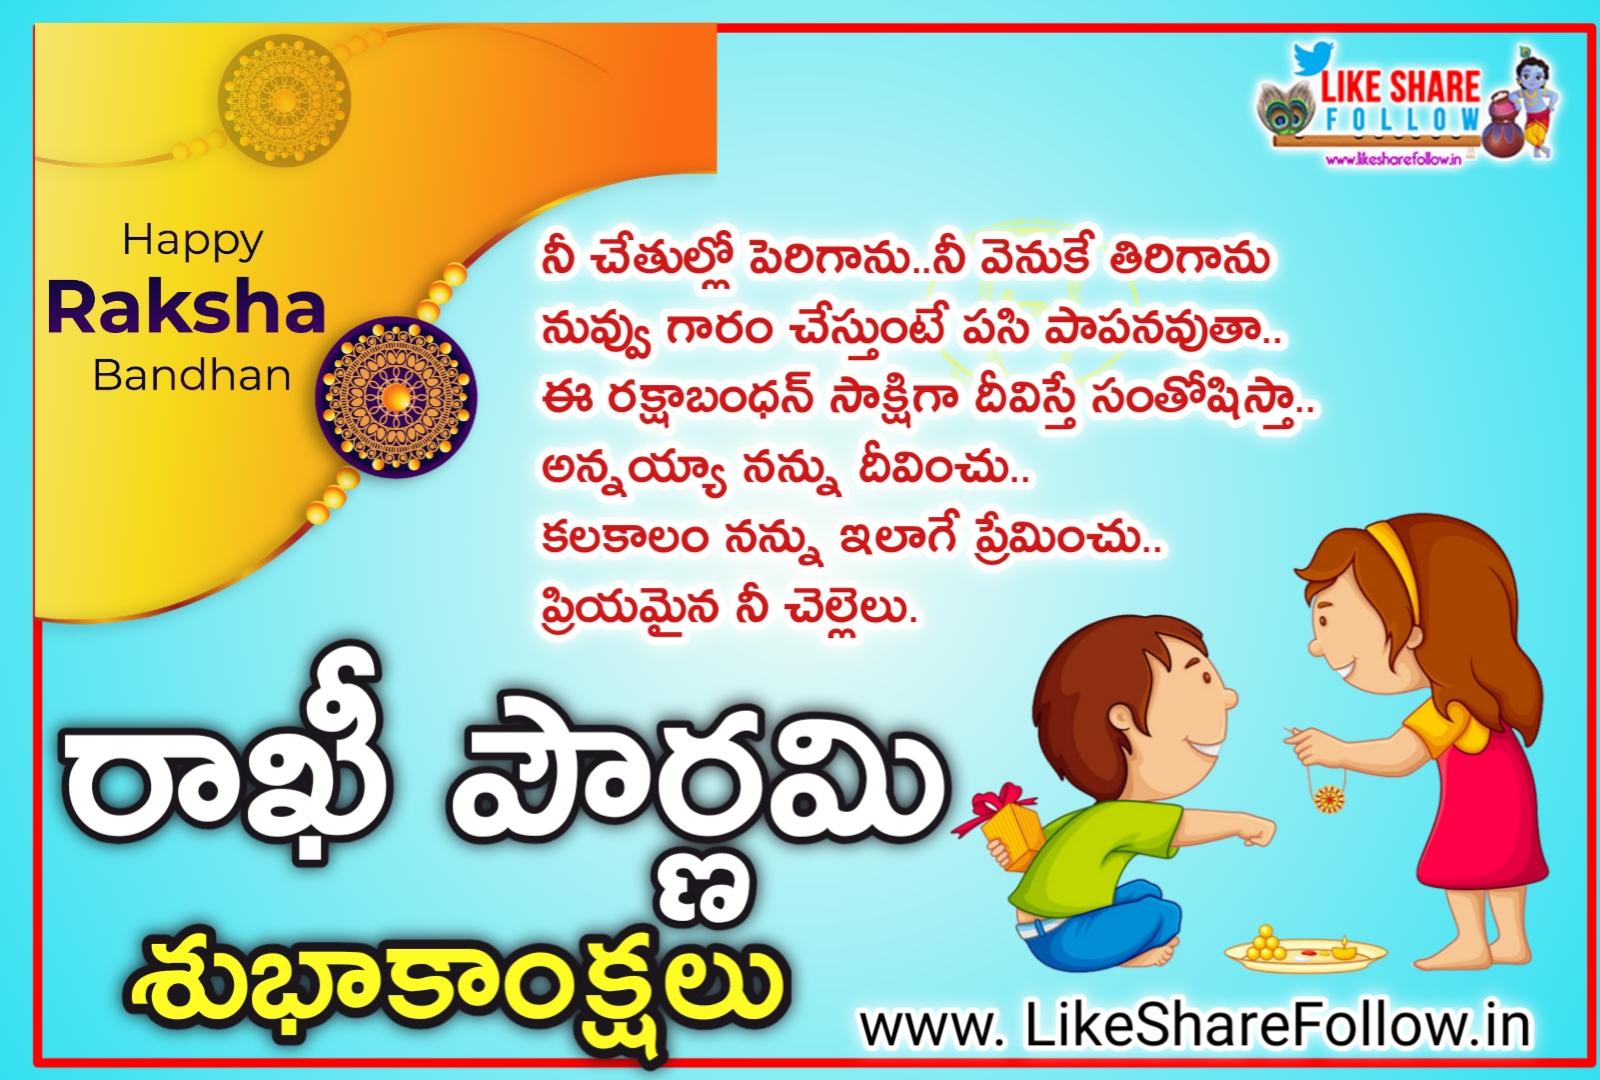 Happy raksha Bandhan 2021 wishes images in Telugu